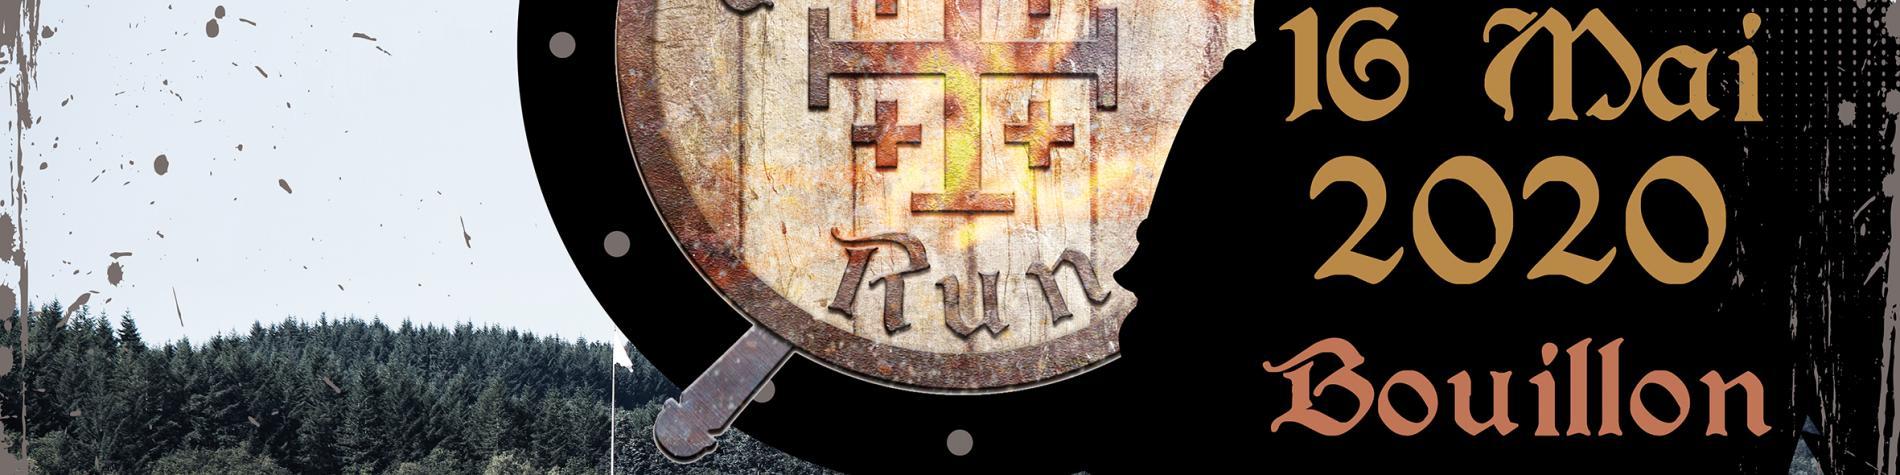 Medieval Run - Bouillon